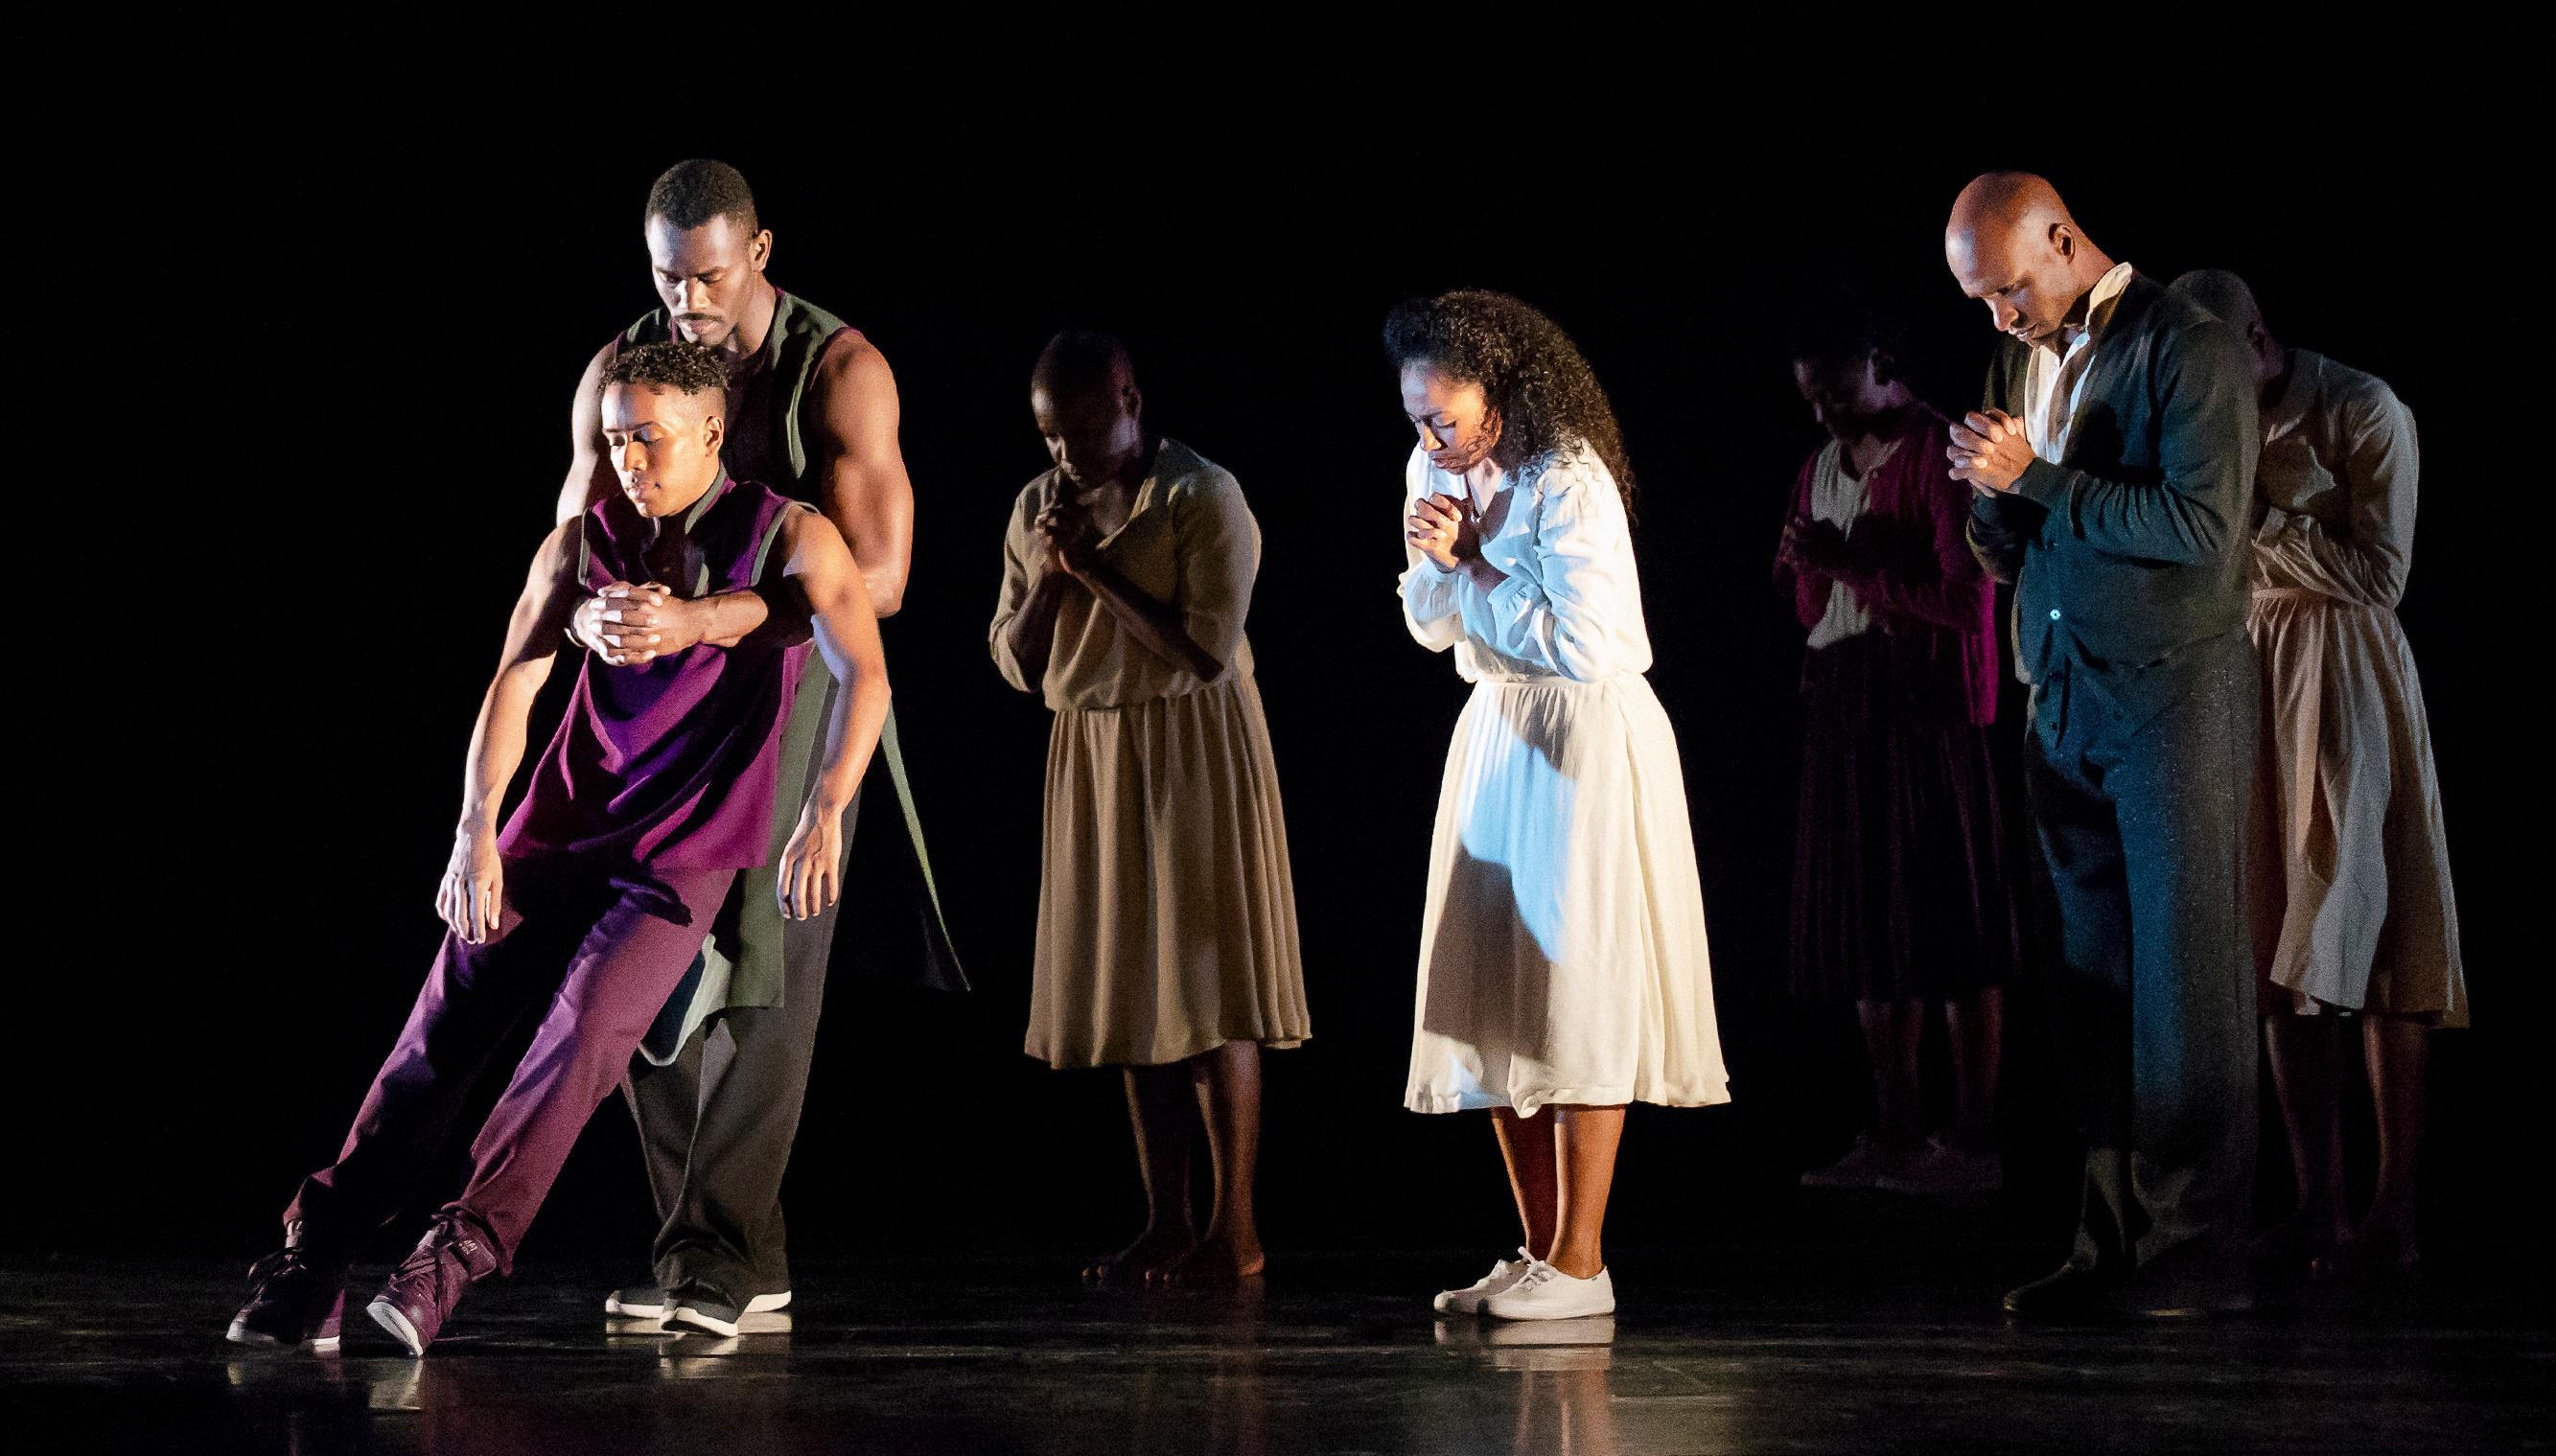 Spirit rising, feet swizzling: the joy of Alvin Ailey American Dance Theater